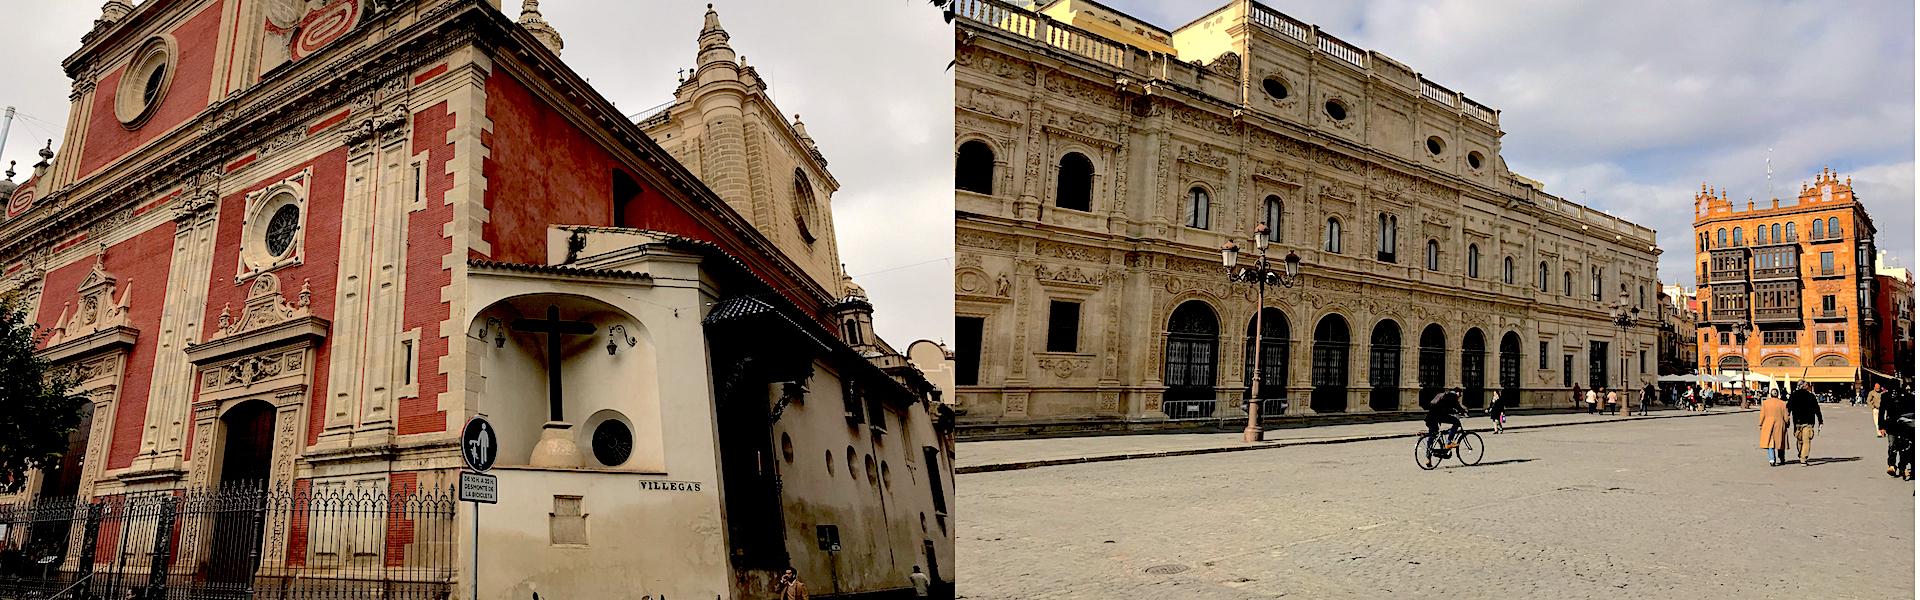 Seville Blog